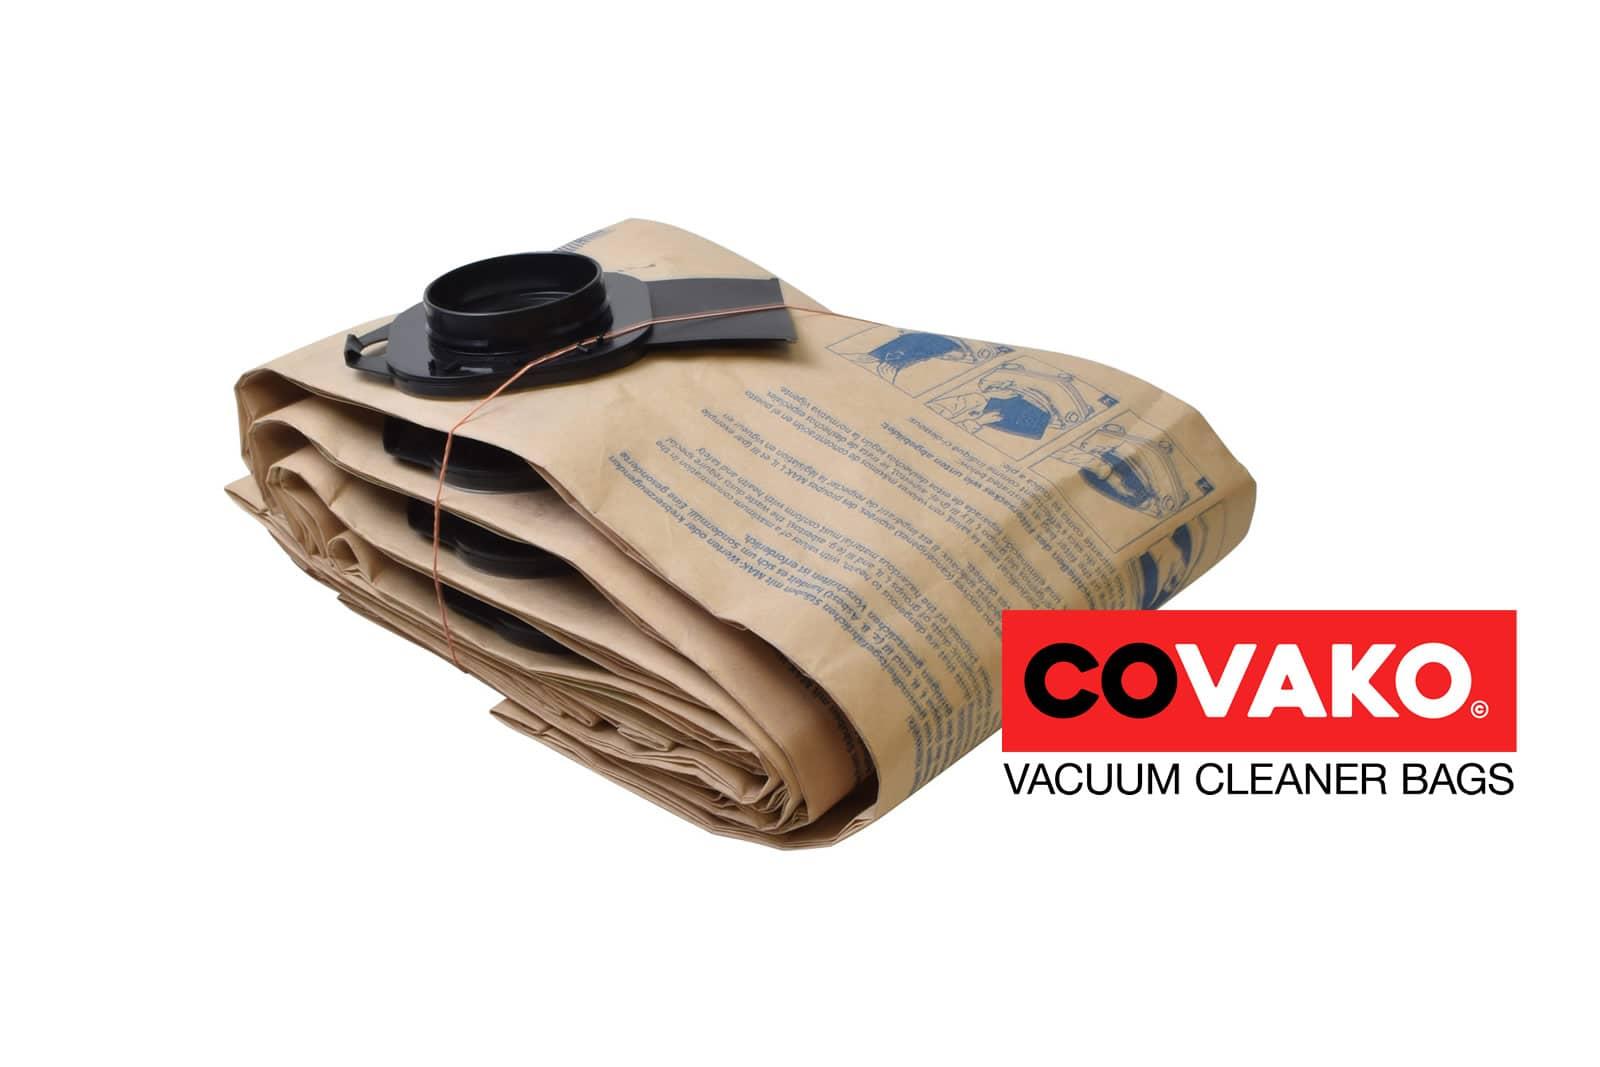 Wap 302001493 / Paper - Wap vacuum cleaner bags